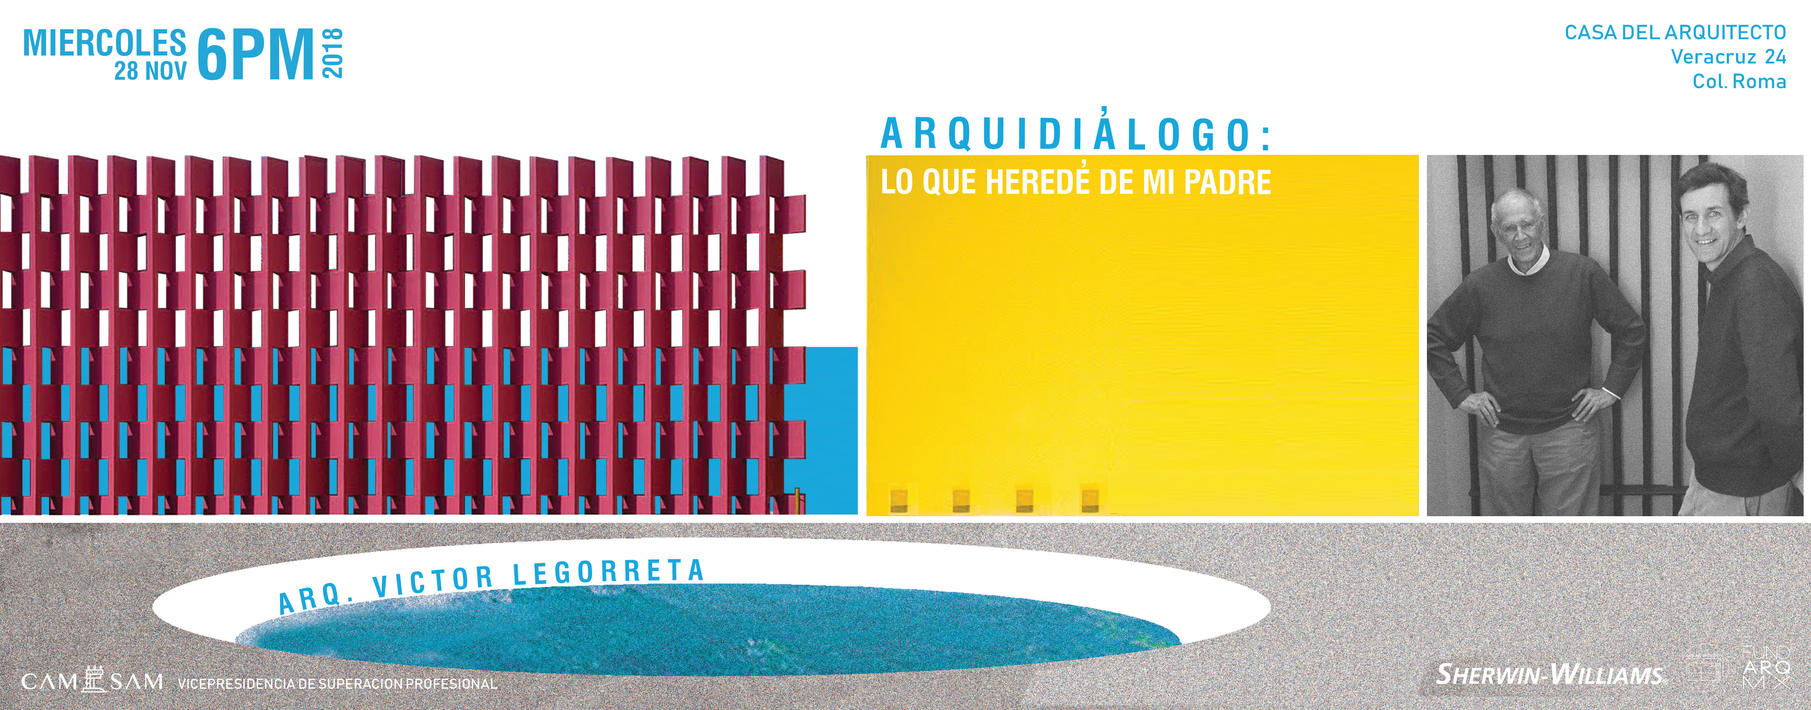 ARQUIDIÁLOGO_LEGORRETA-NOV18a.jpg